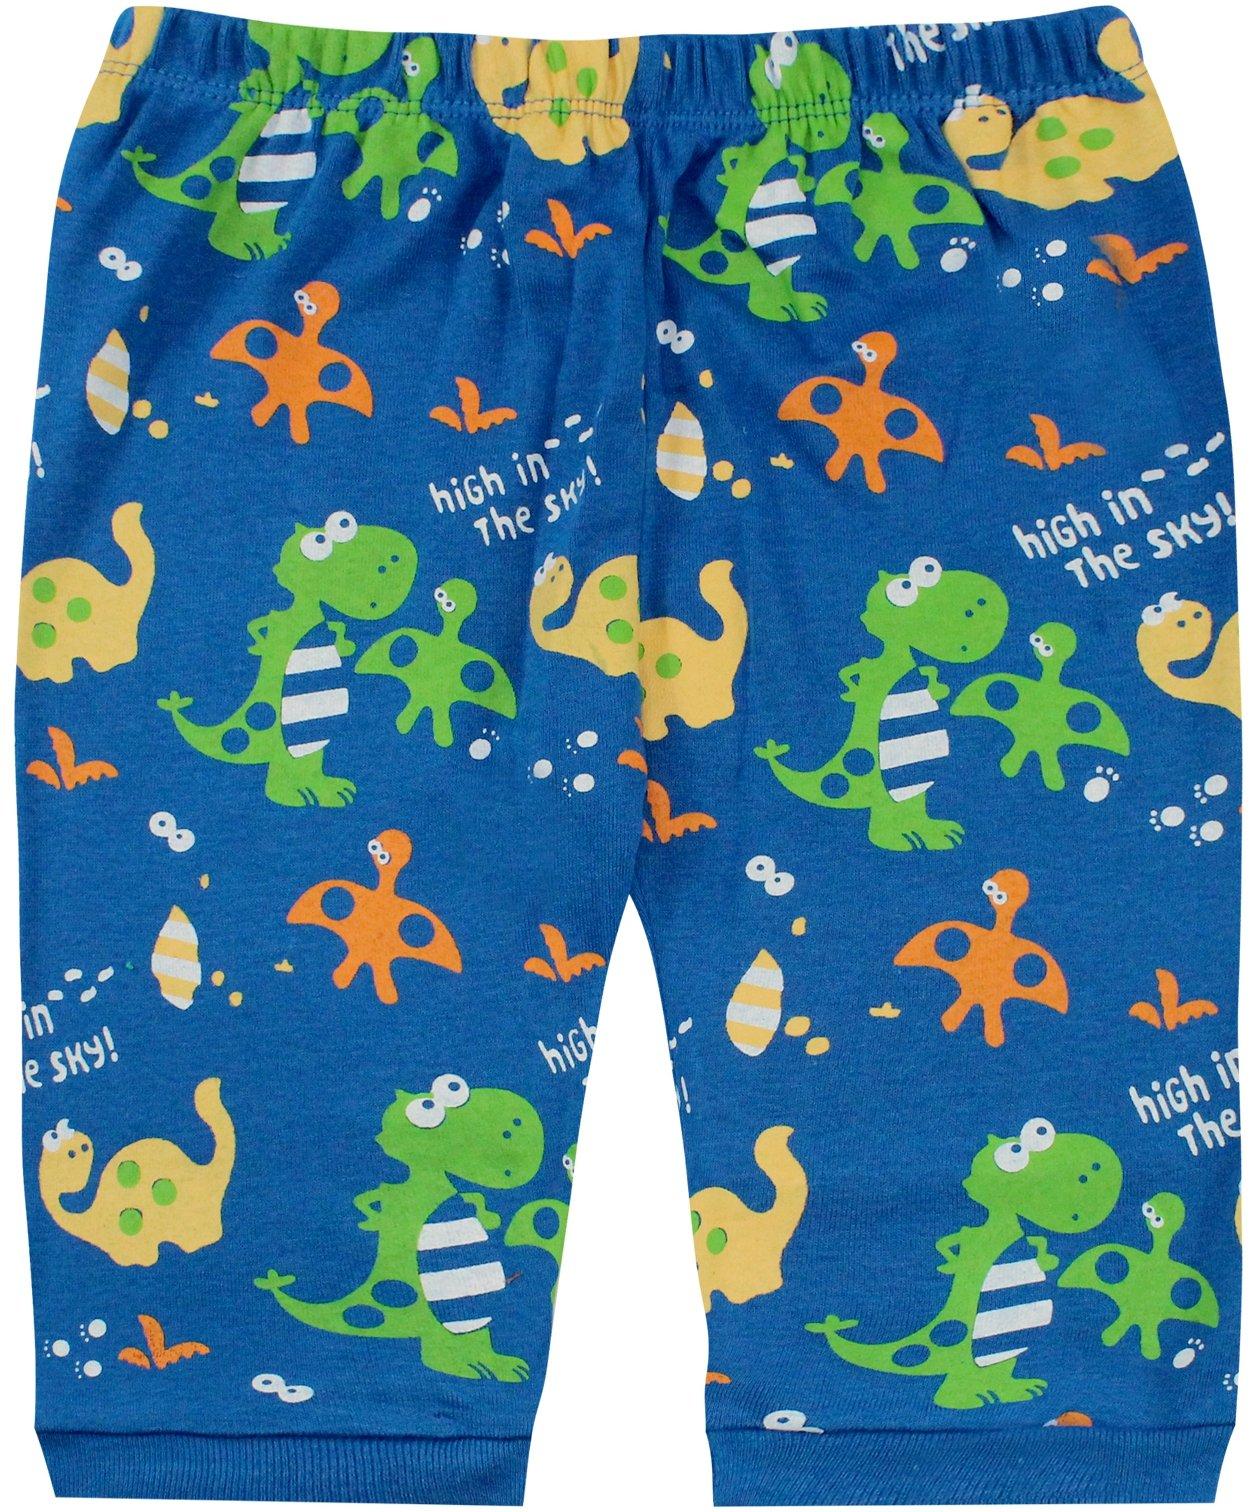 Boys Pajamas Boys Dinosaur Little Kid Shorts Set 100% Cotton Clothes Short Sleeves Sleepwear 8Y by shelry (Image #3)